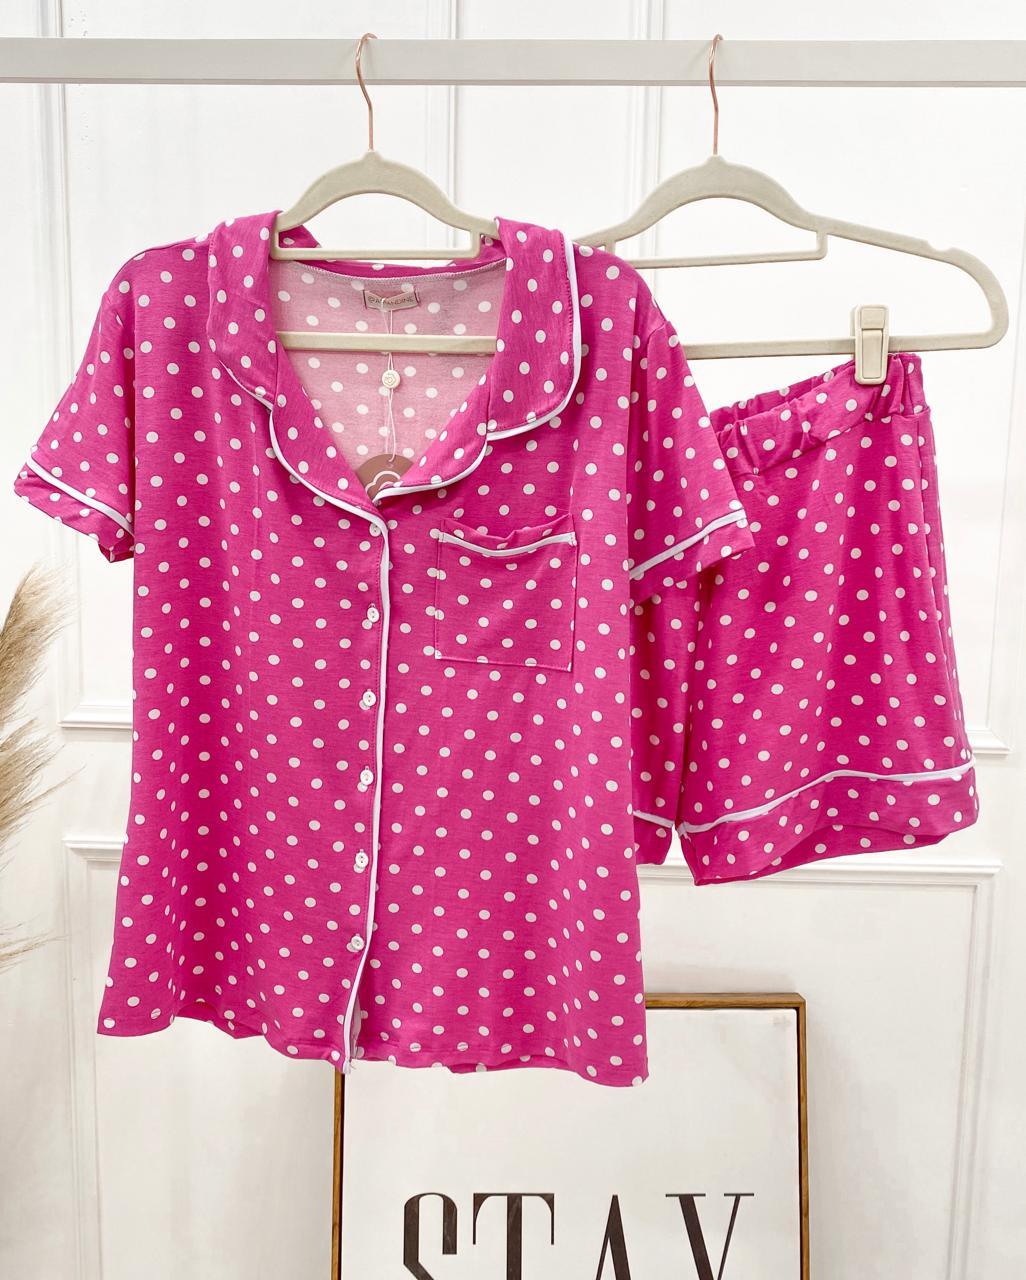 Pijama Rosa de Poá